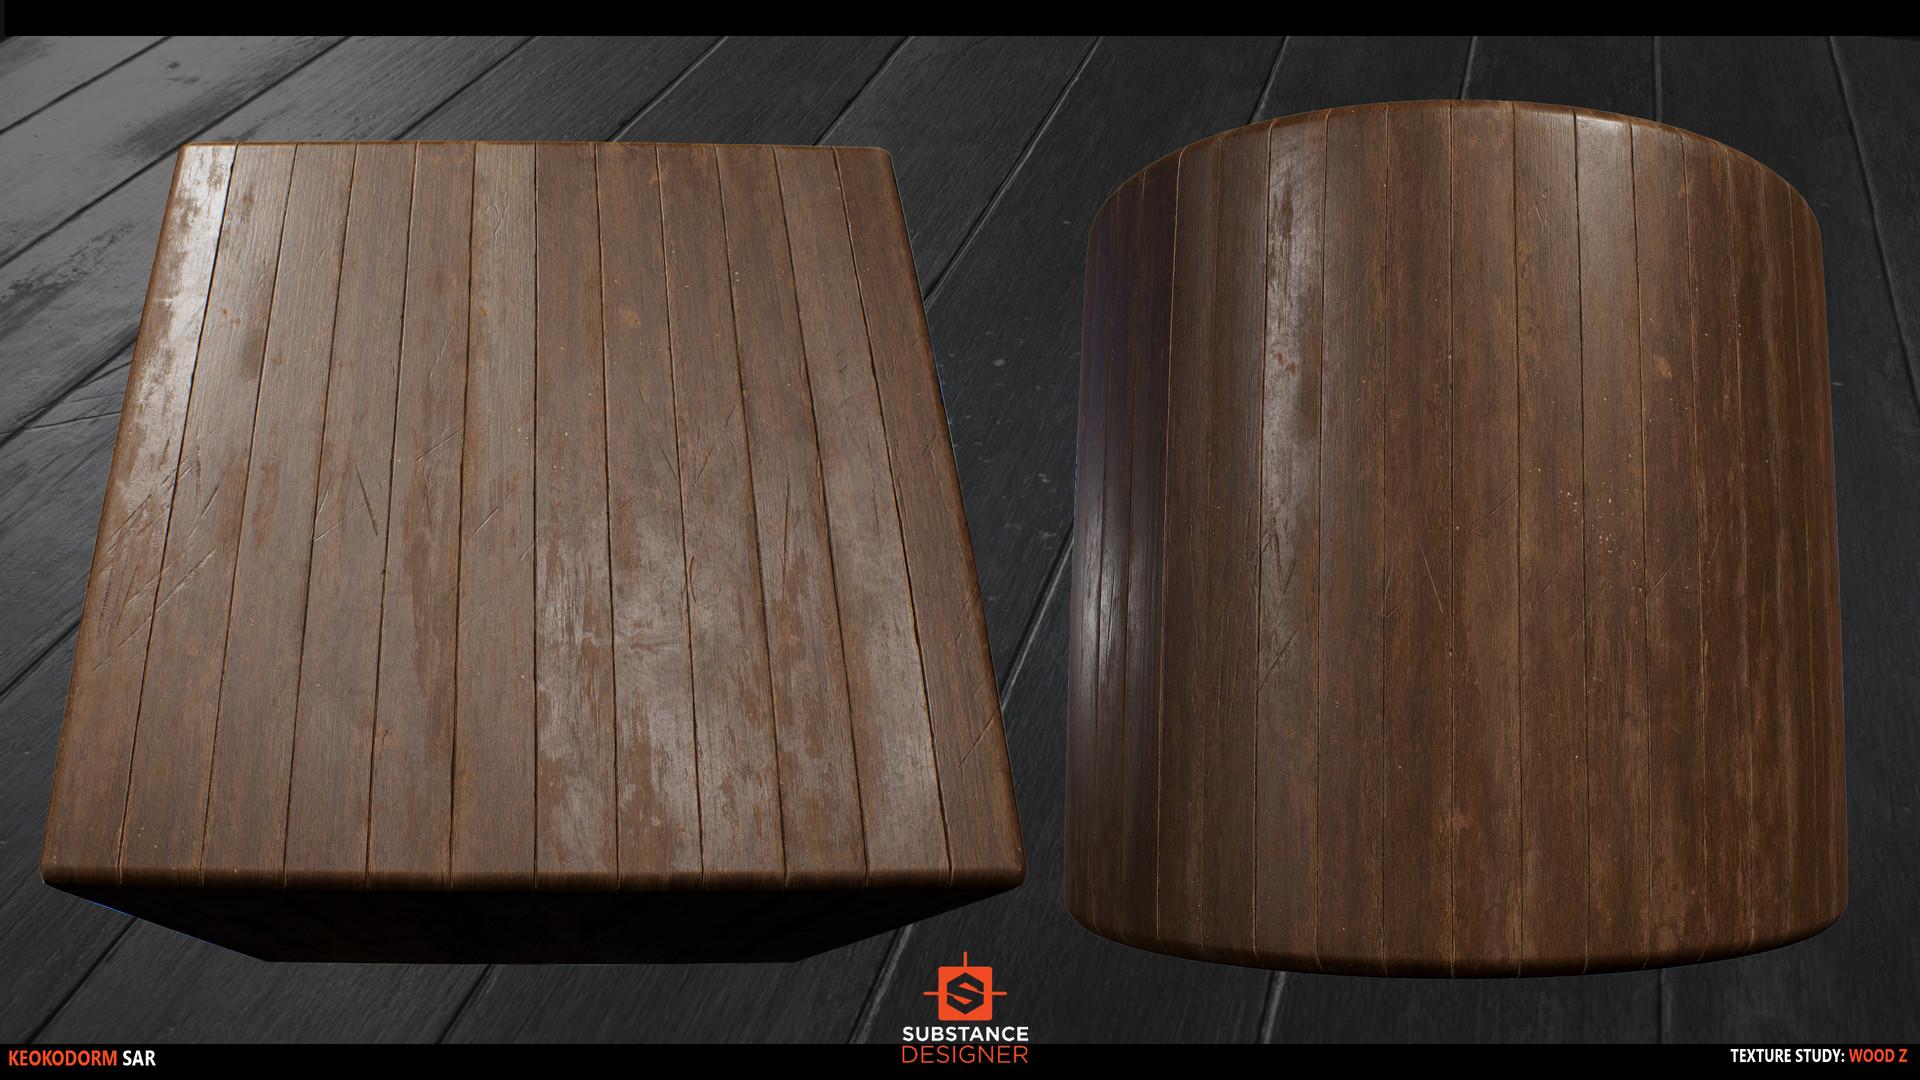 Keokodorm keo sar portfolio2016hd wood z